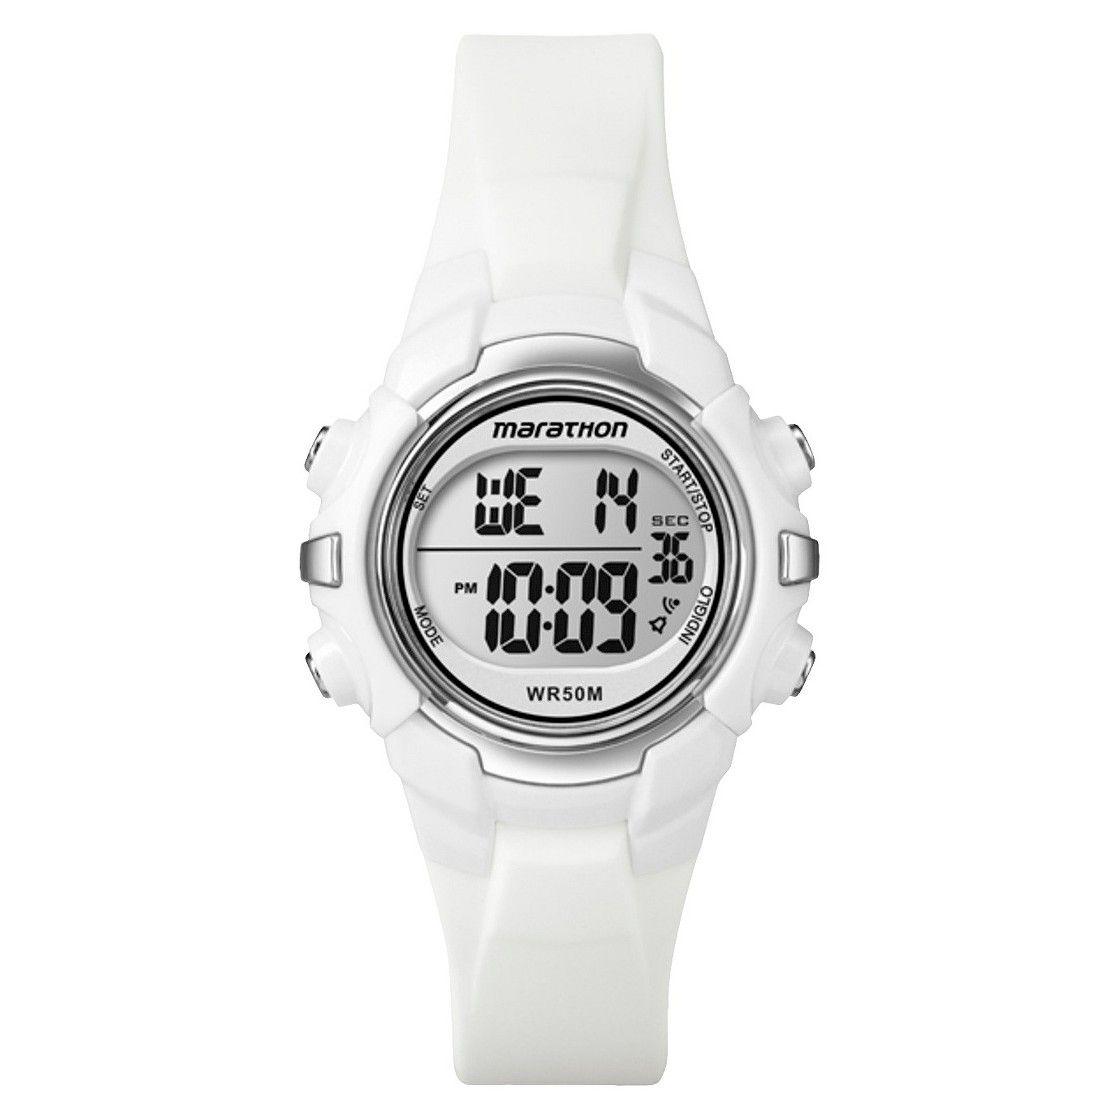 4c1db2e03e4c Marathon By Timex Women s Digital Sports Watch with White Top Ring - White